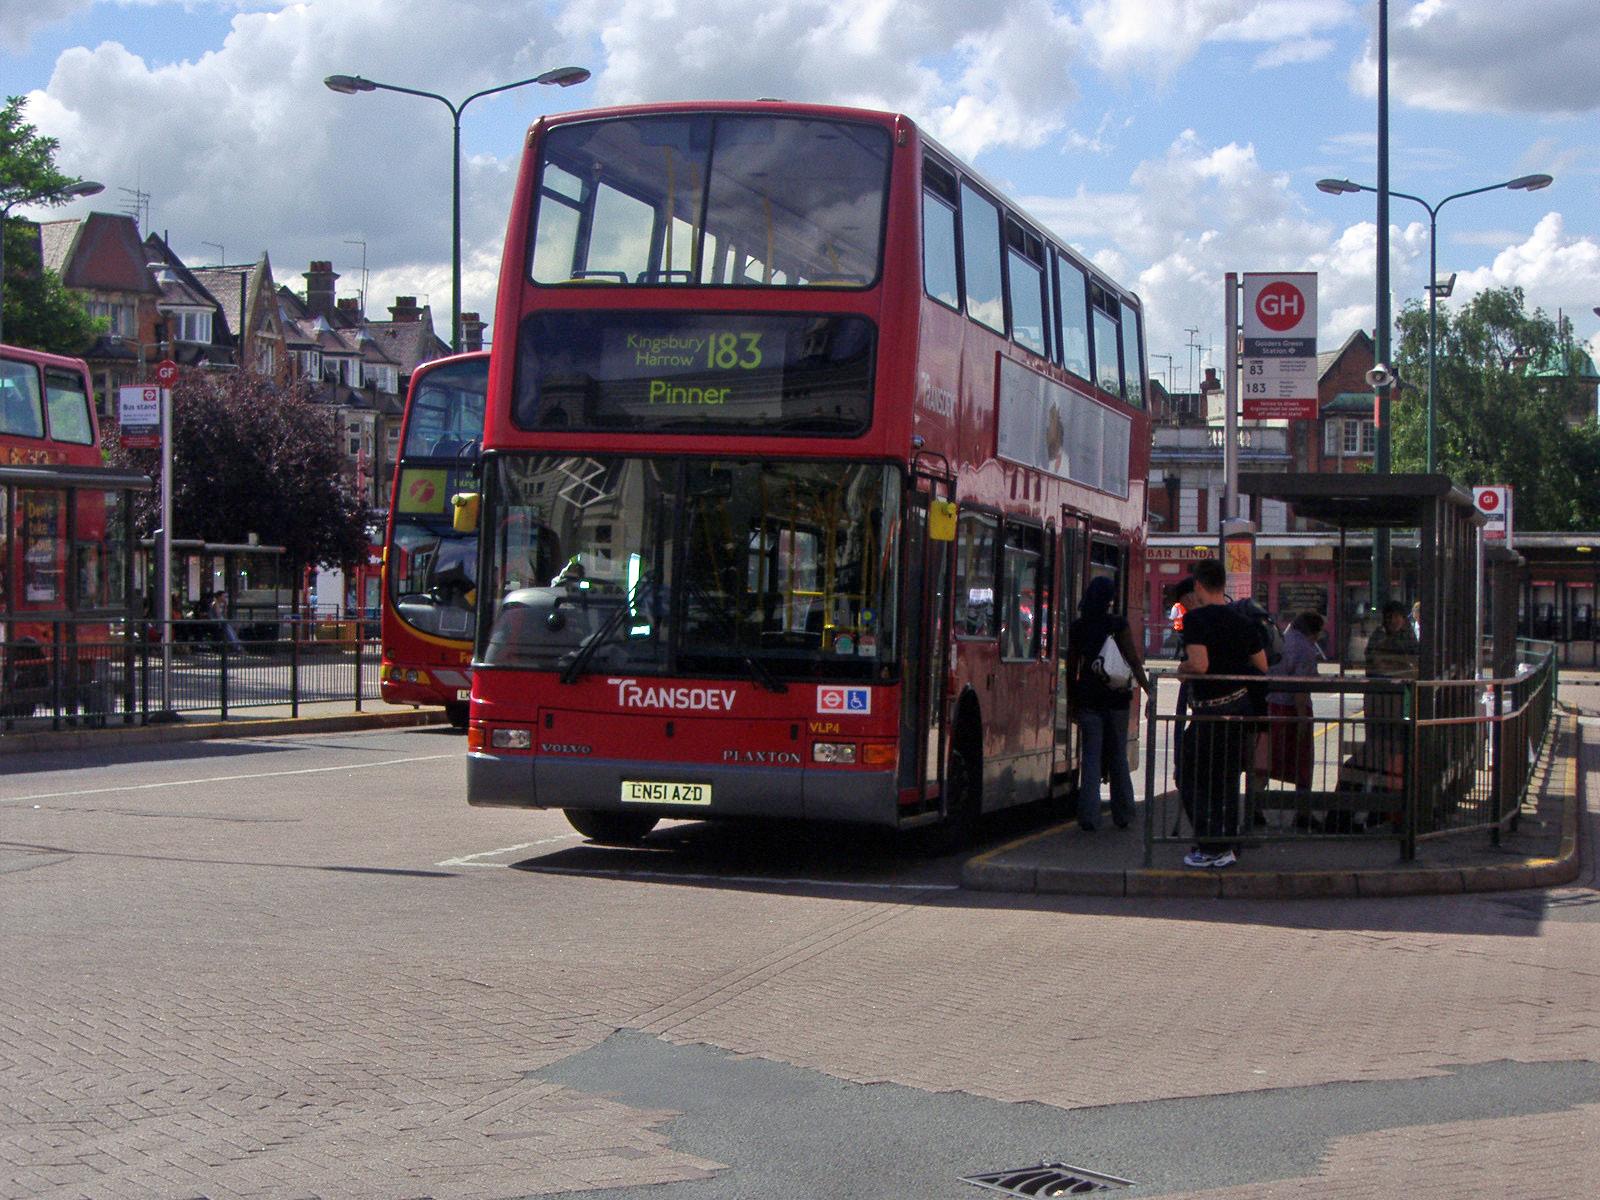 File:London Buses route 183 golders green jpg - Wikimedia